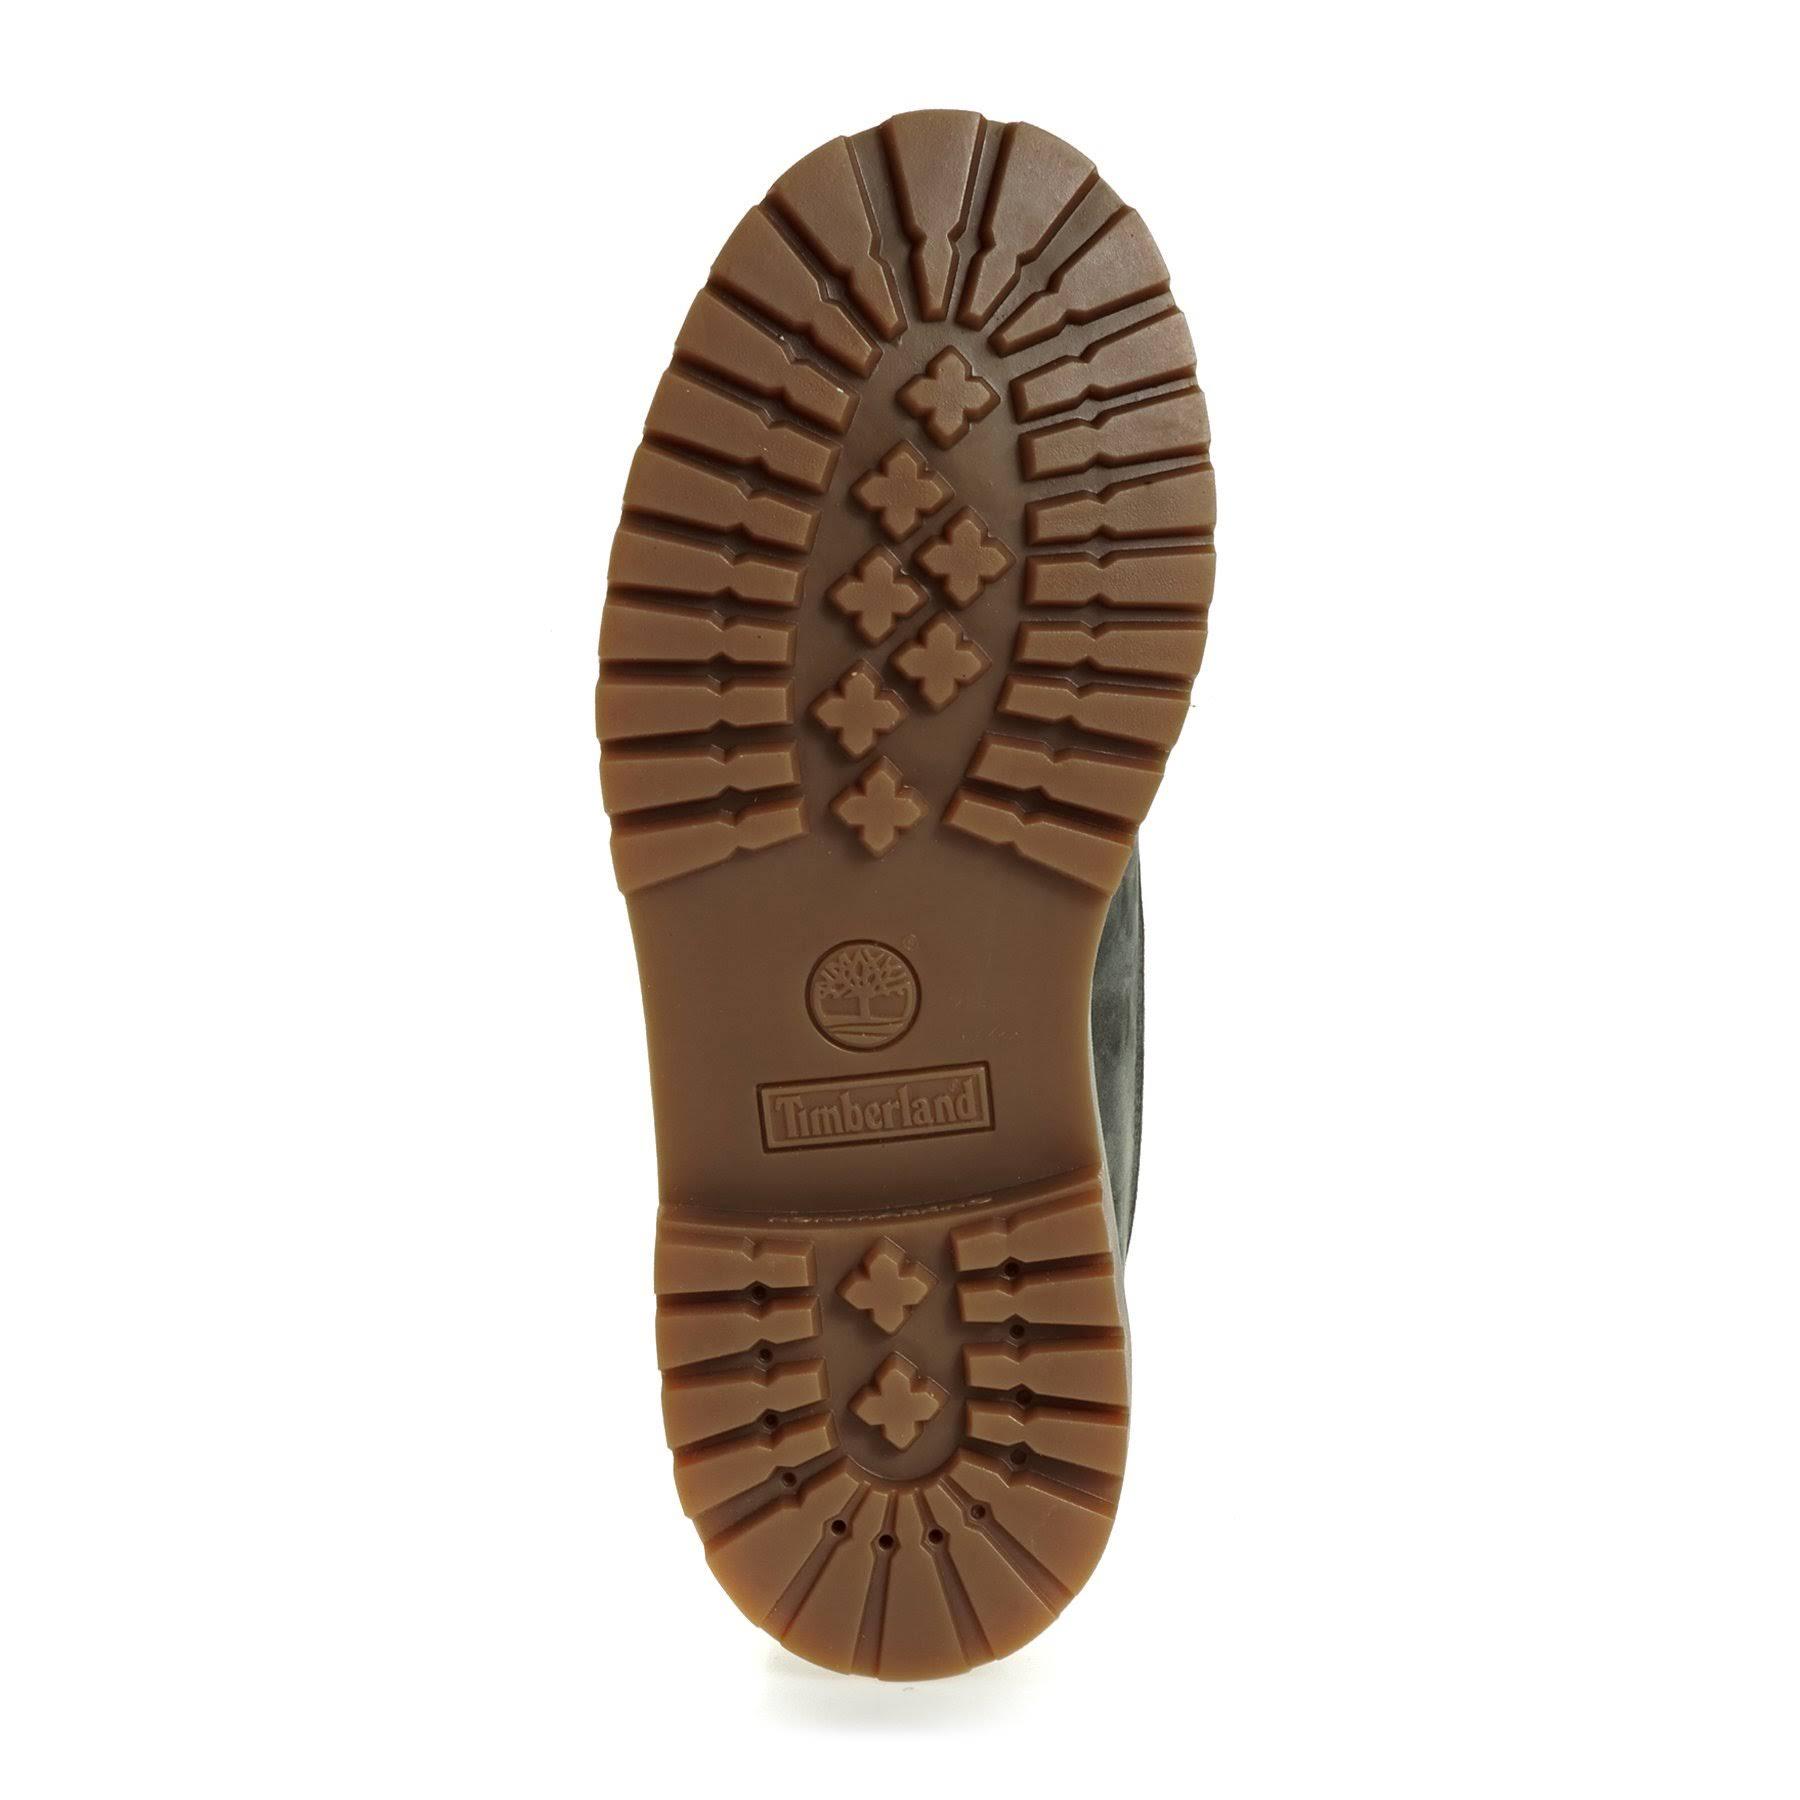 Timberland Nubuck Grey 3 Size Premium Cool Waterproof Boots Grade School Boys 6